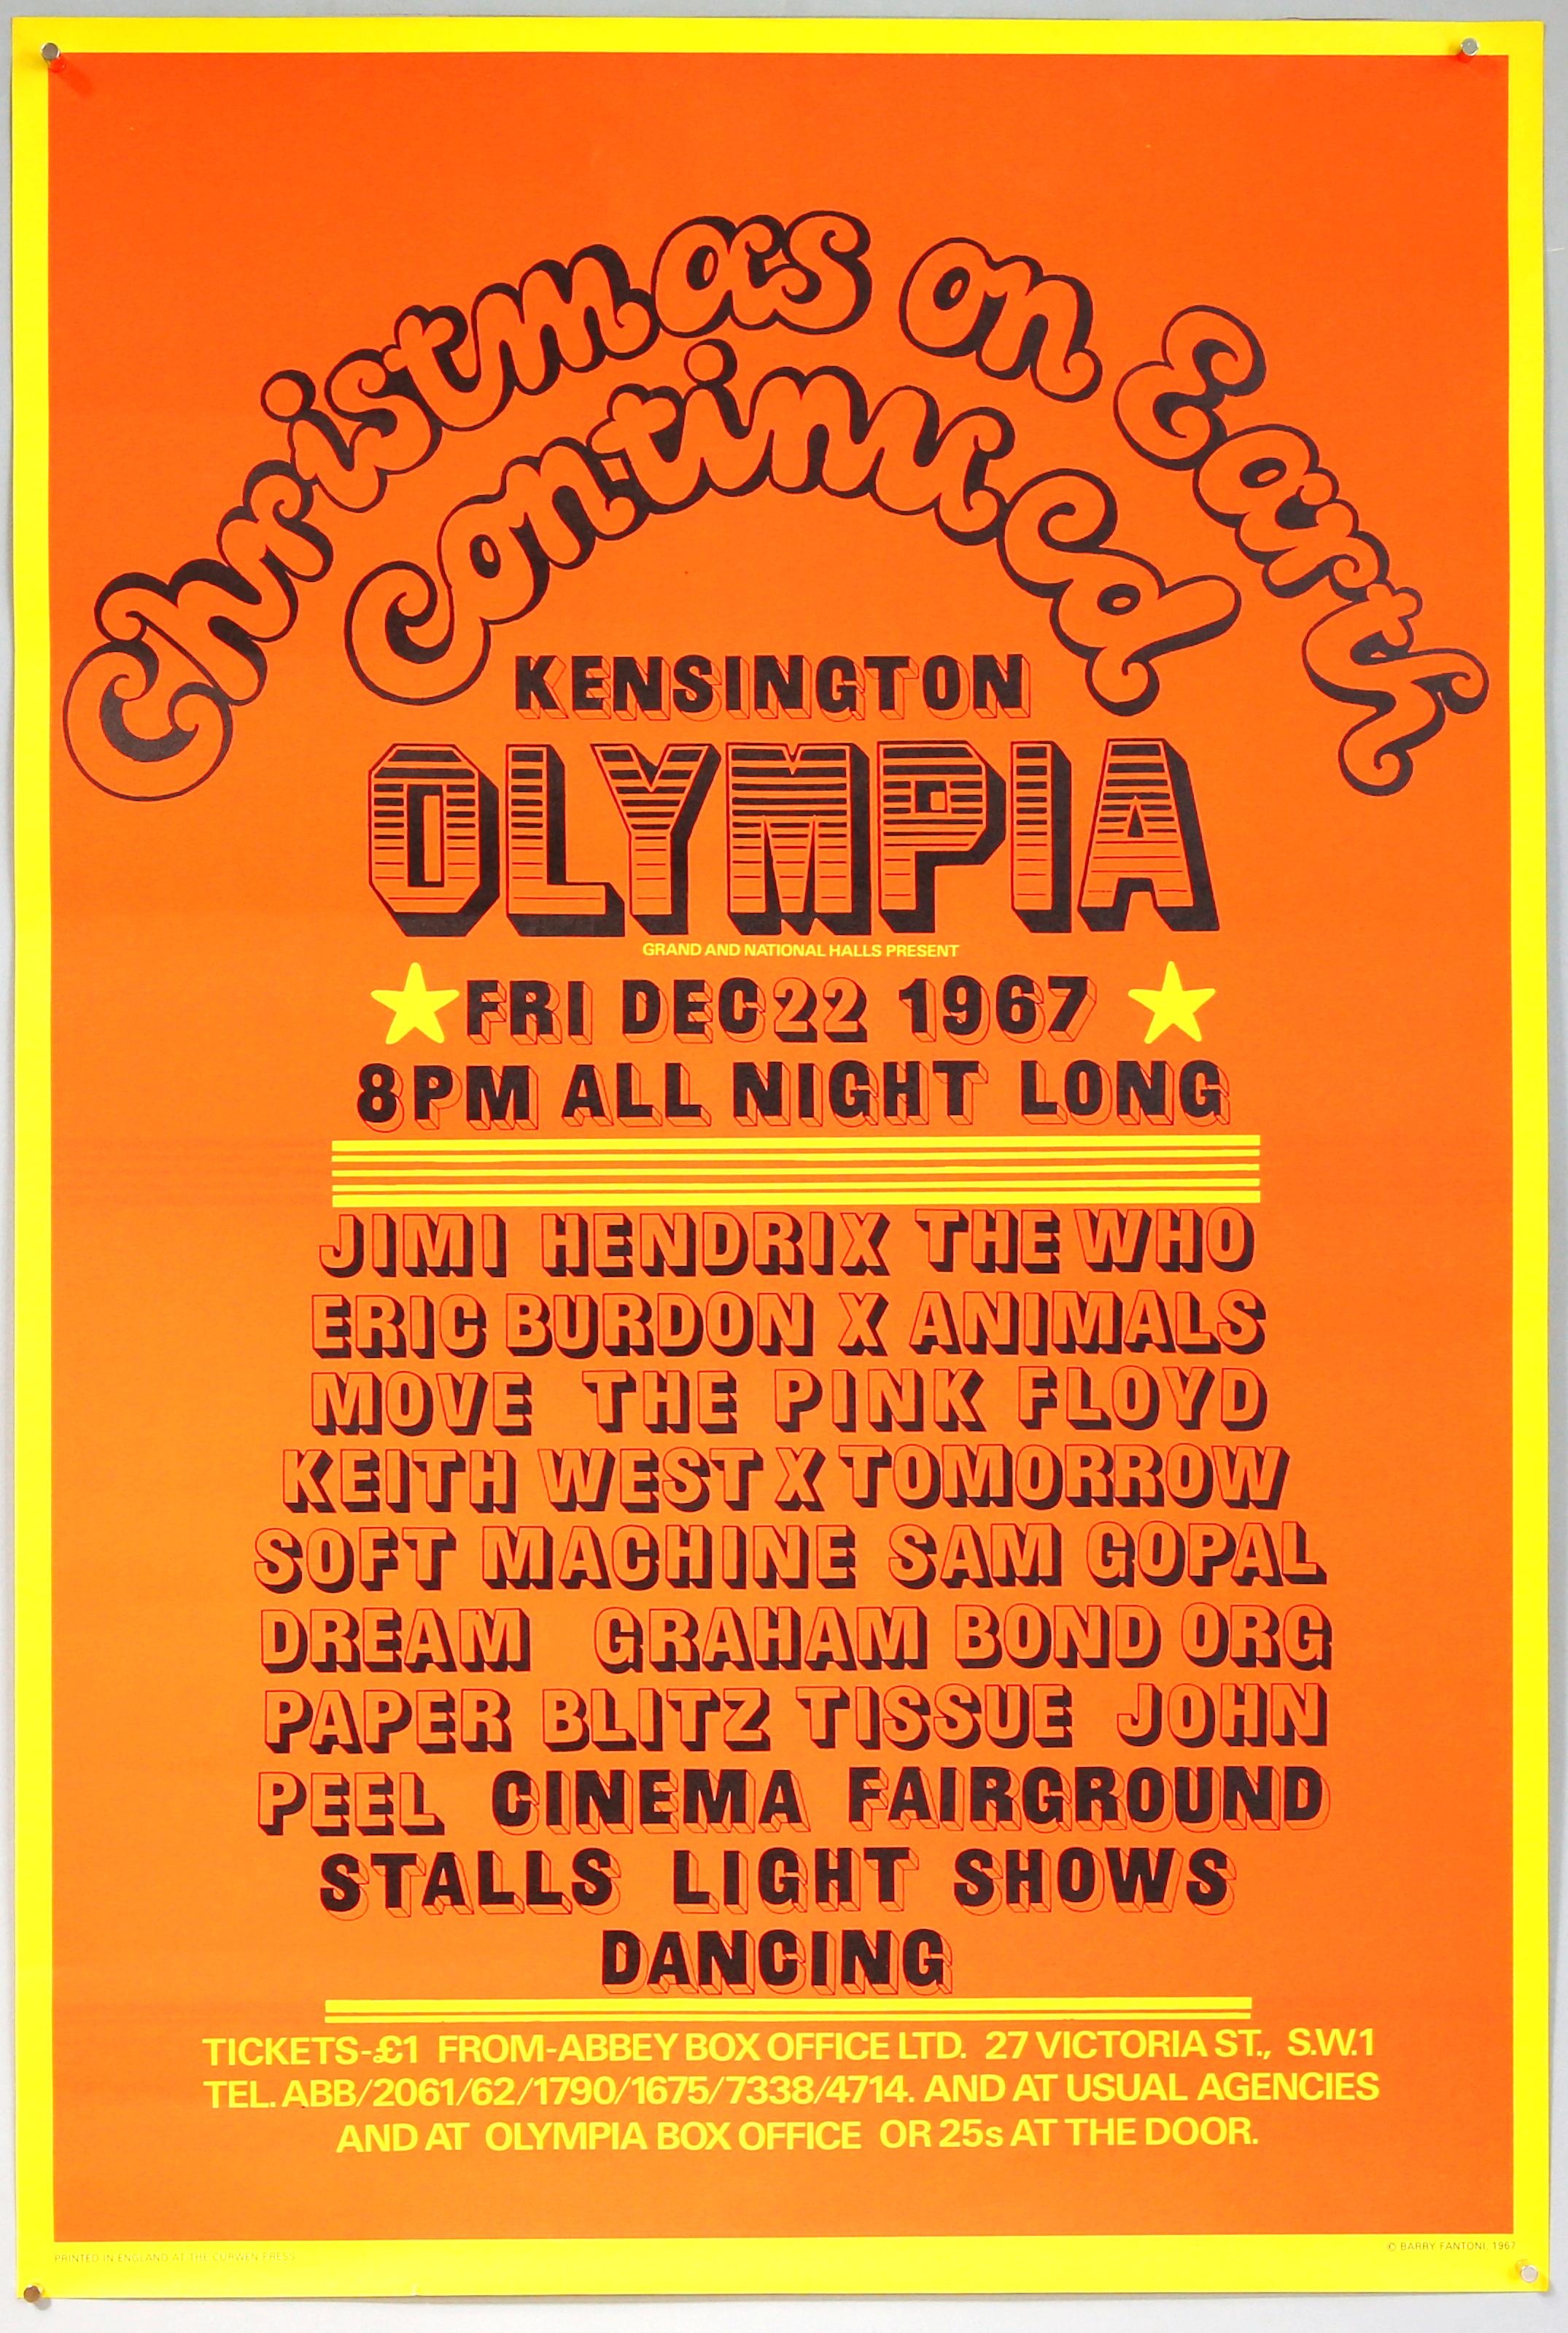 Hendrix poster – estimate £1500-2500